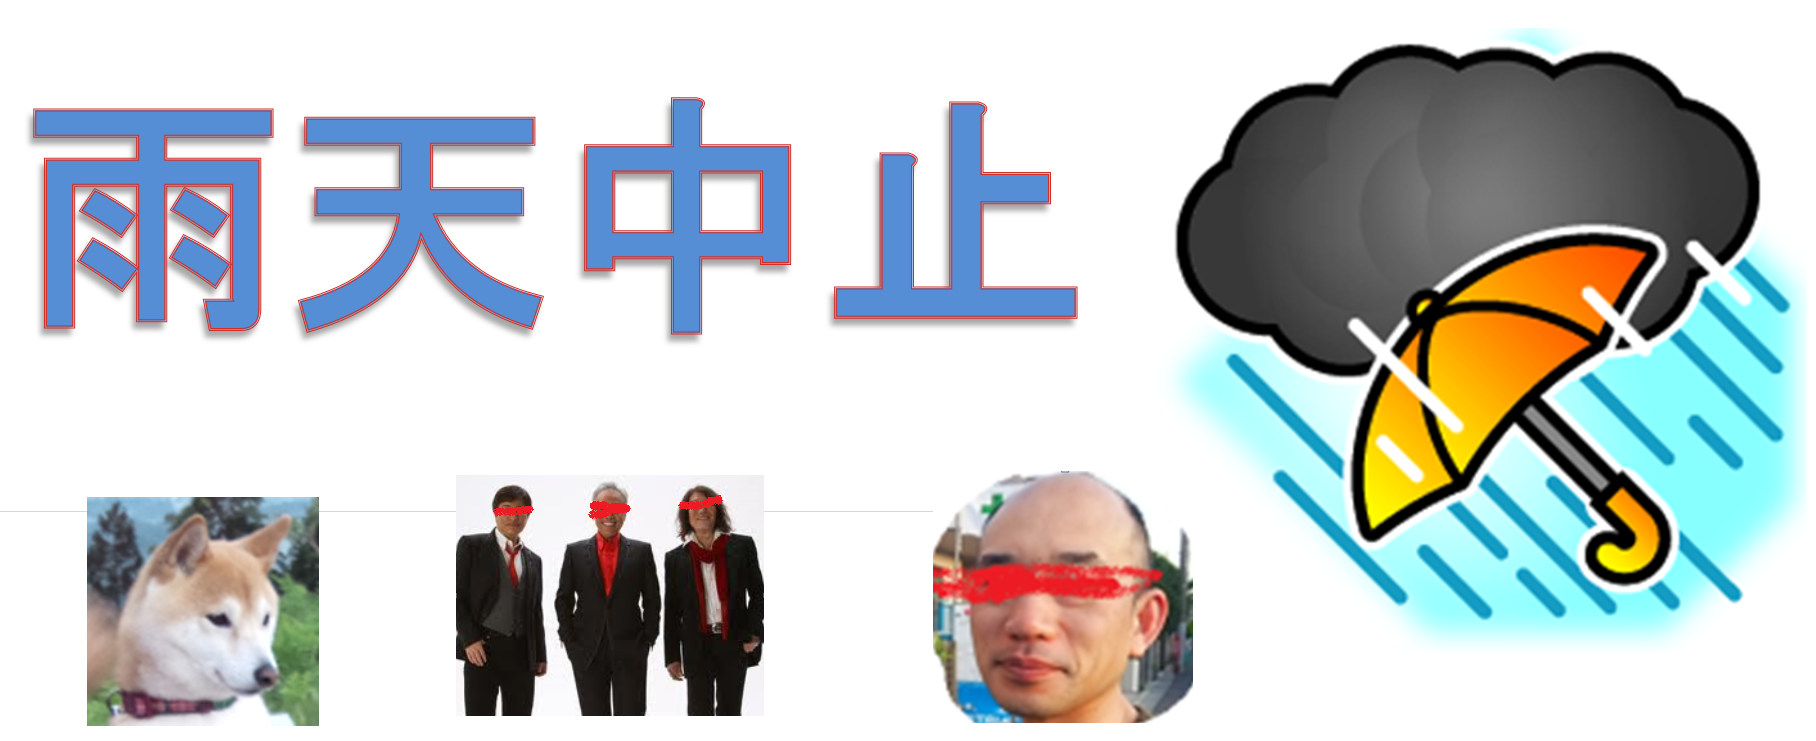 SnapCrab_NoName_2014-7-19_5-8-47_No-00.png